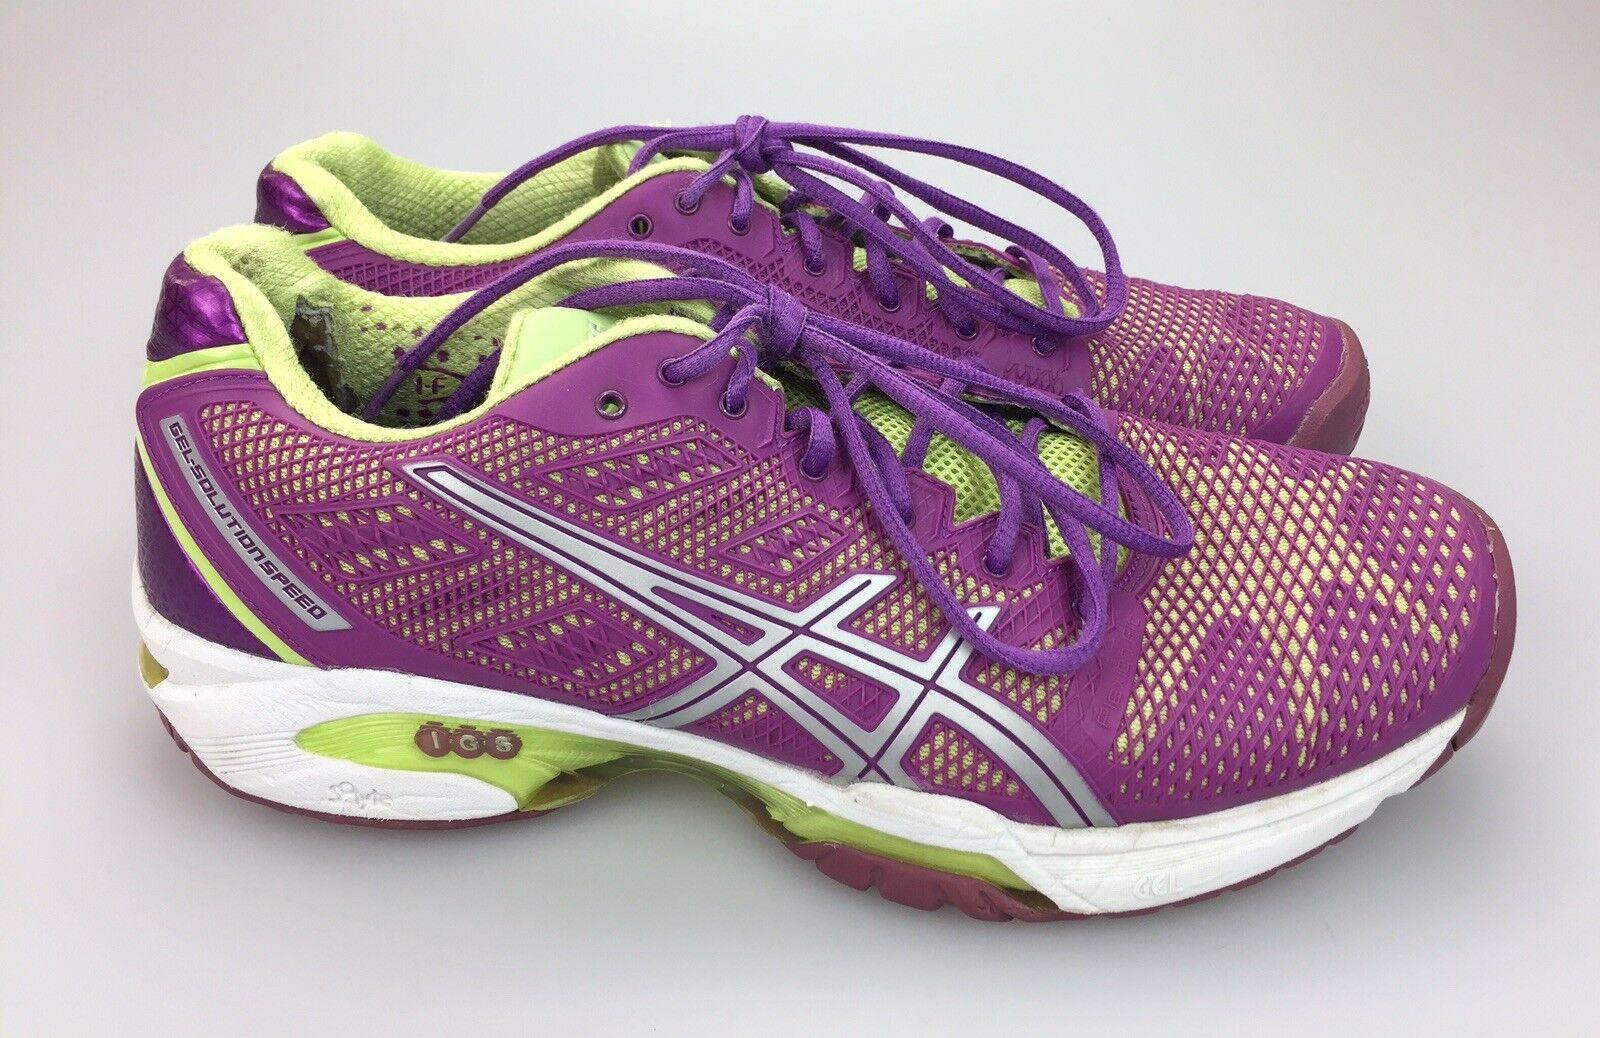 Asics GEL SOLUTION SPEED 2 Running chaussures E450Y femmes's Taille 10 42 violet vert